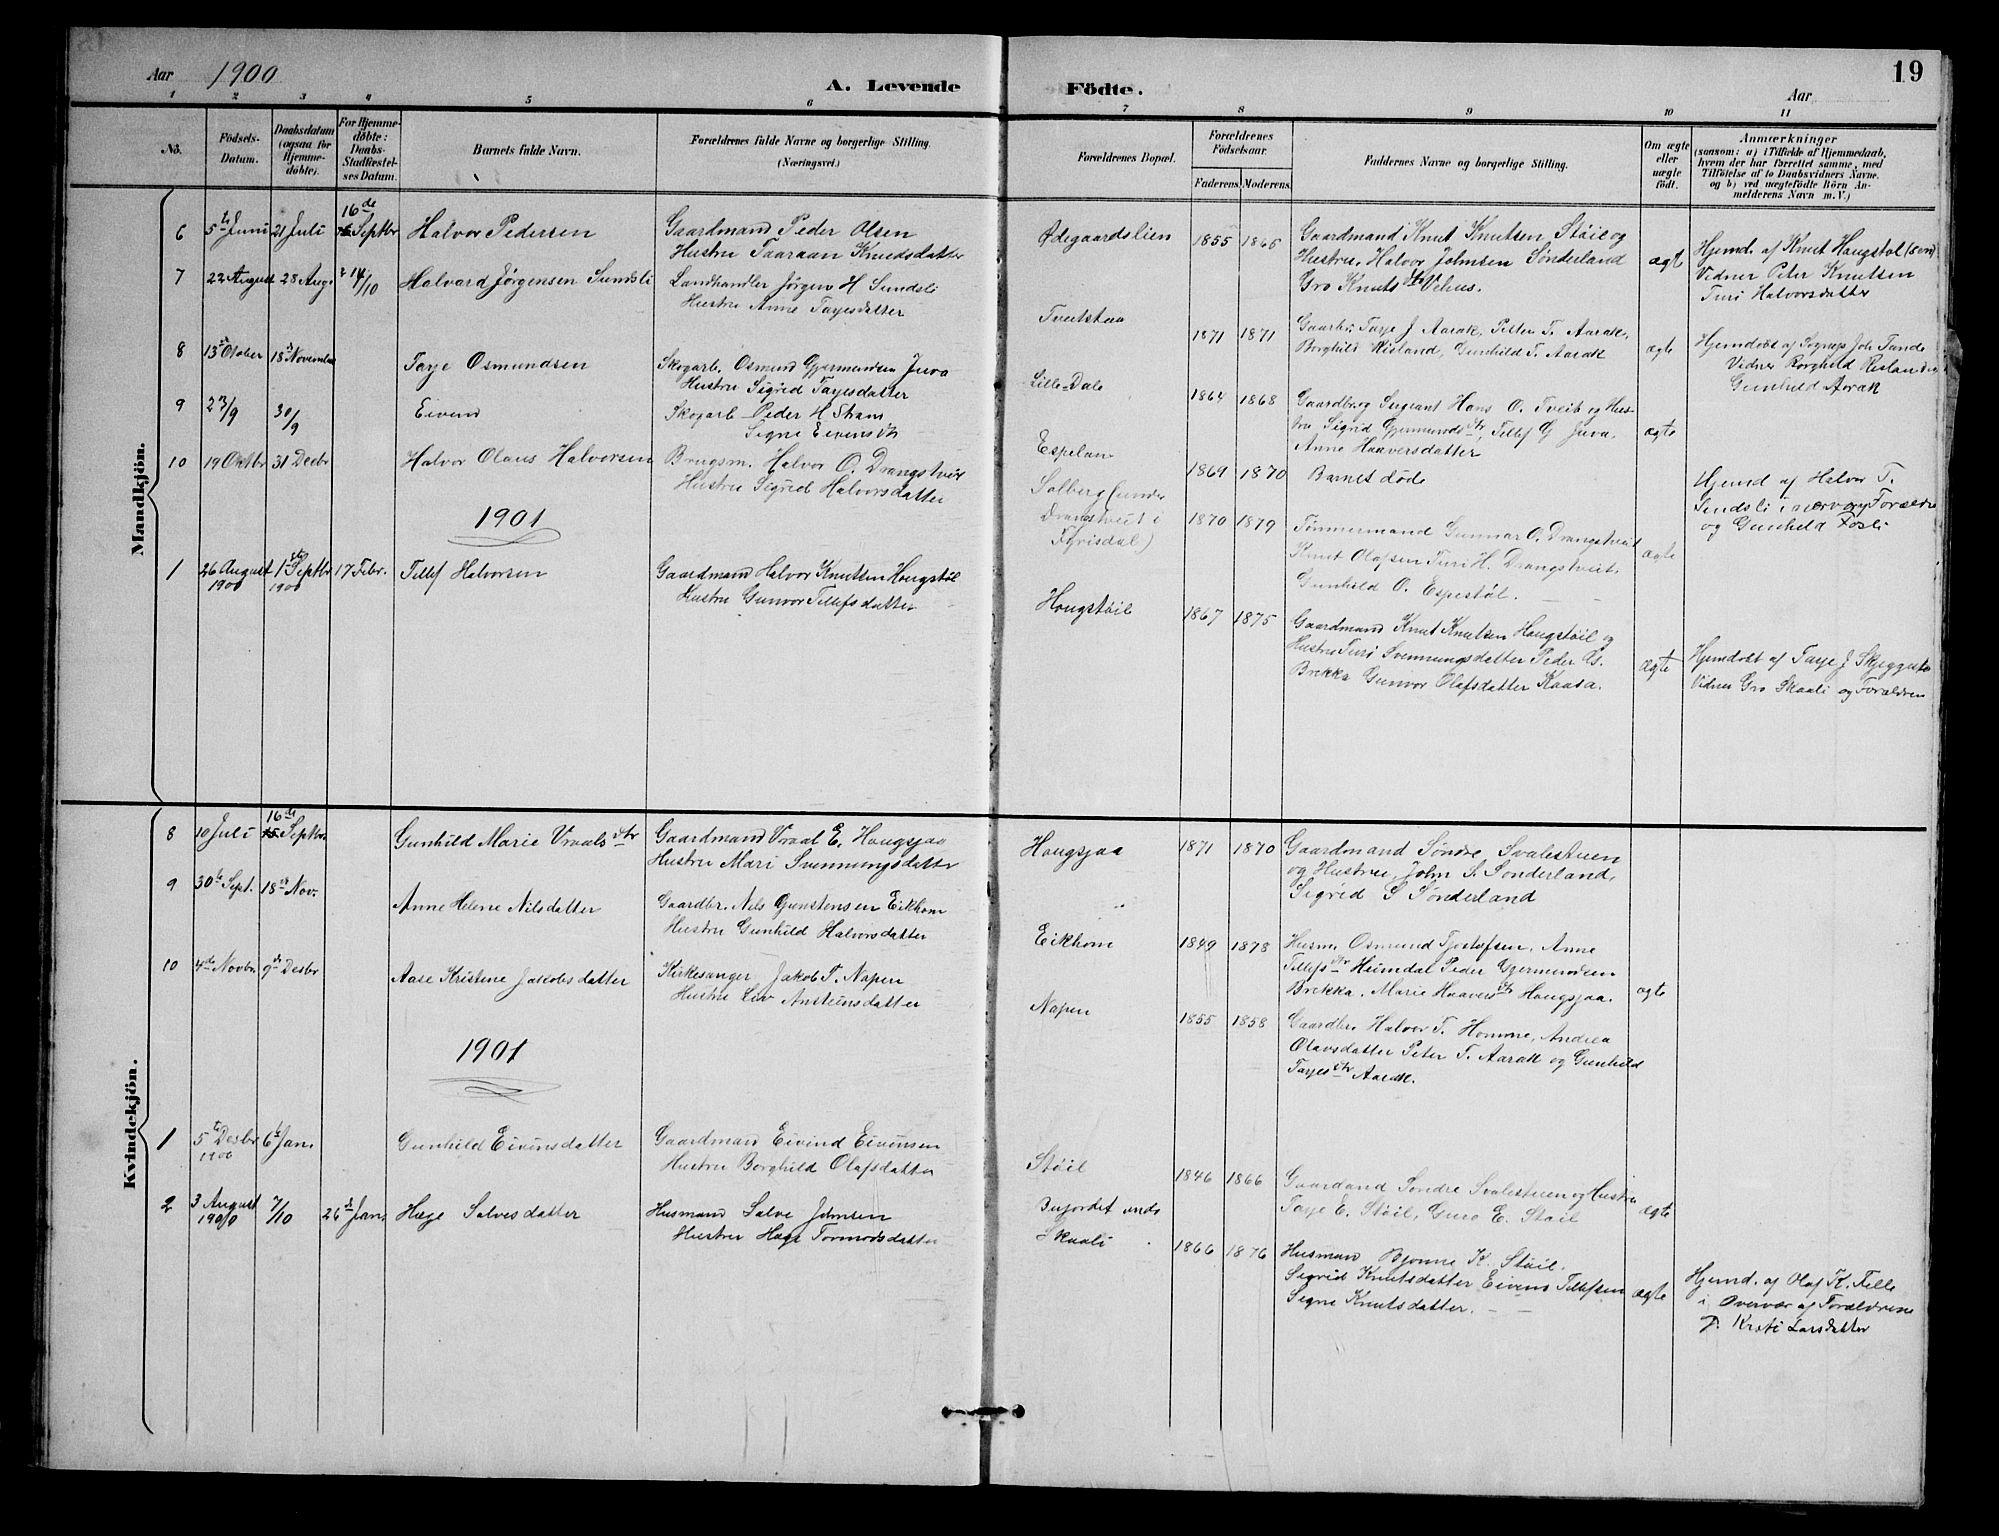 SAKO, Nissedal kirkebøker, G/Gb/L0003: Klokkerbok nr. II 3, 1893-1928, s. 19